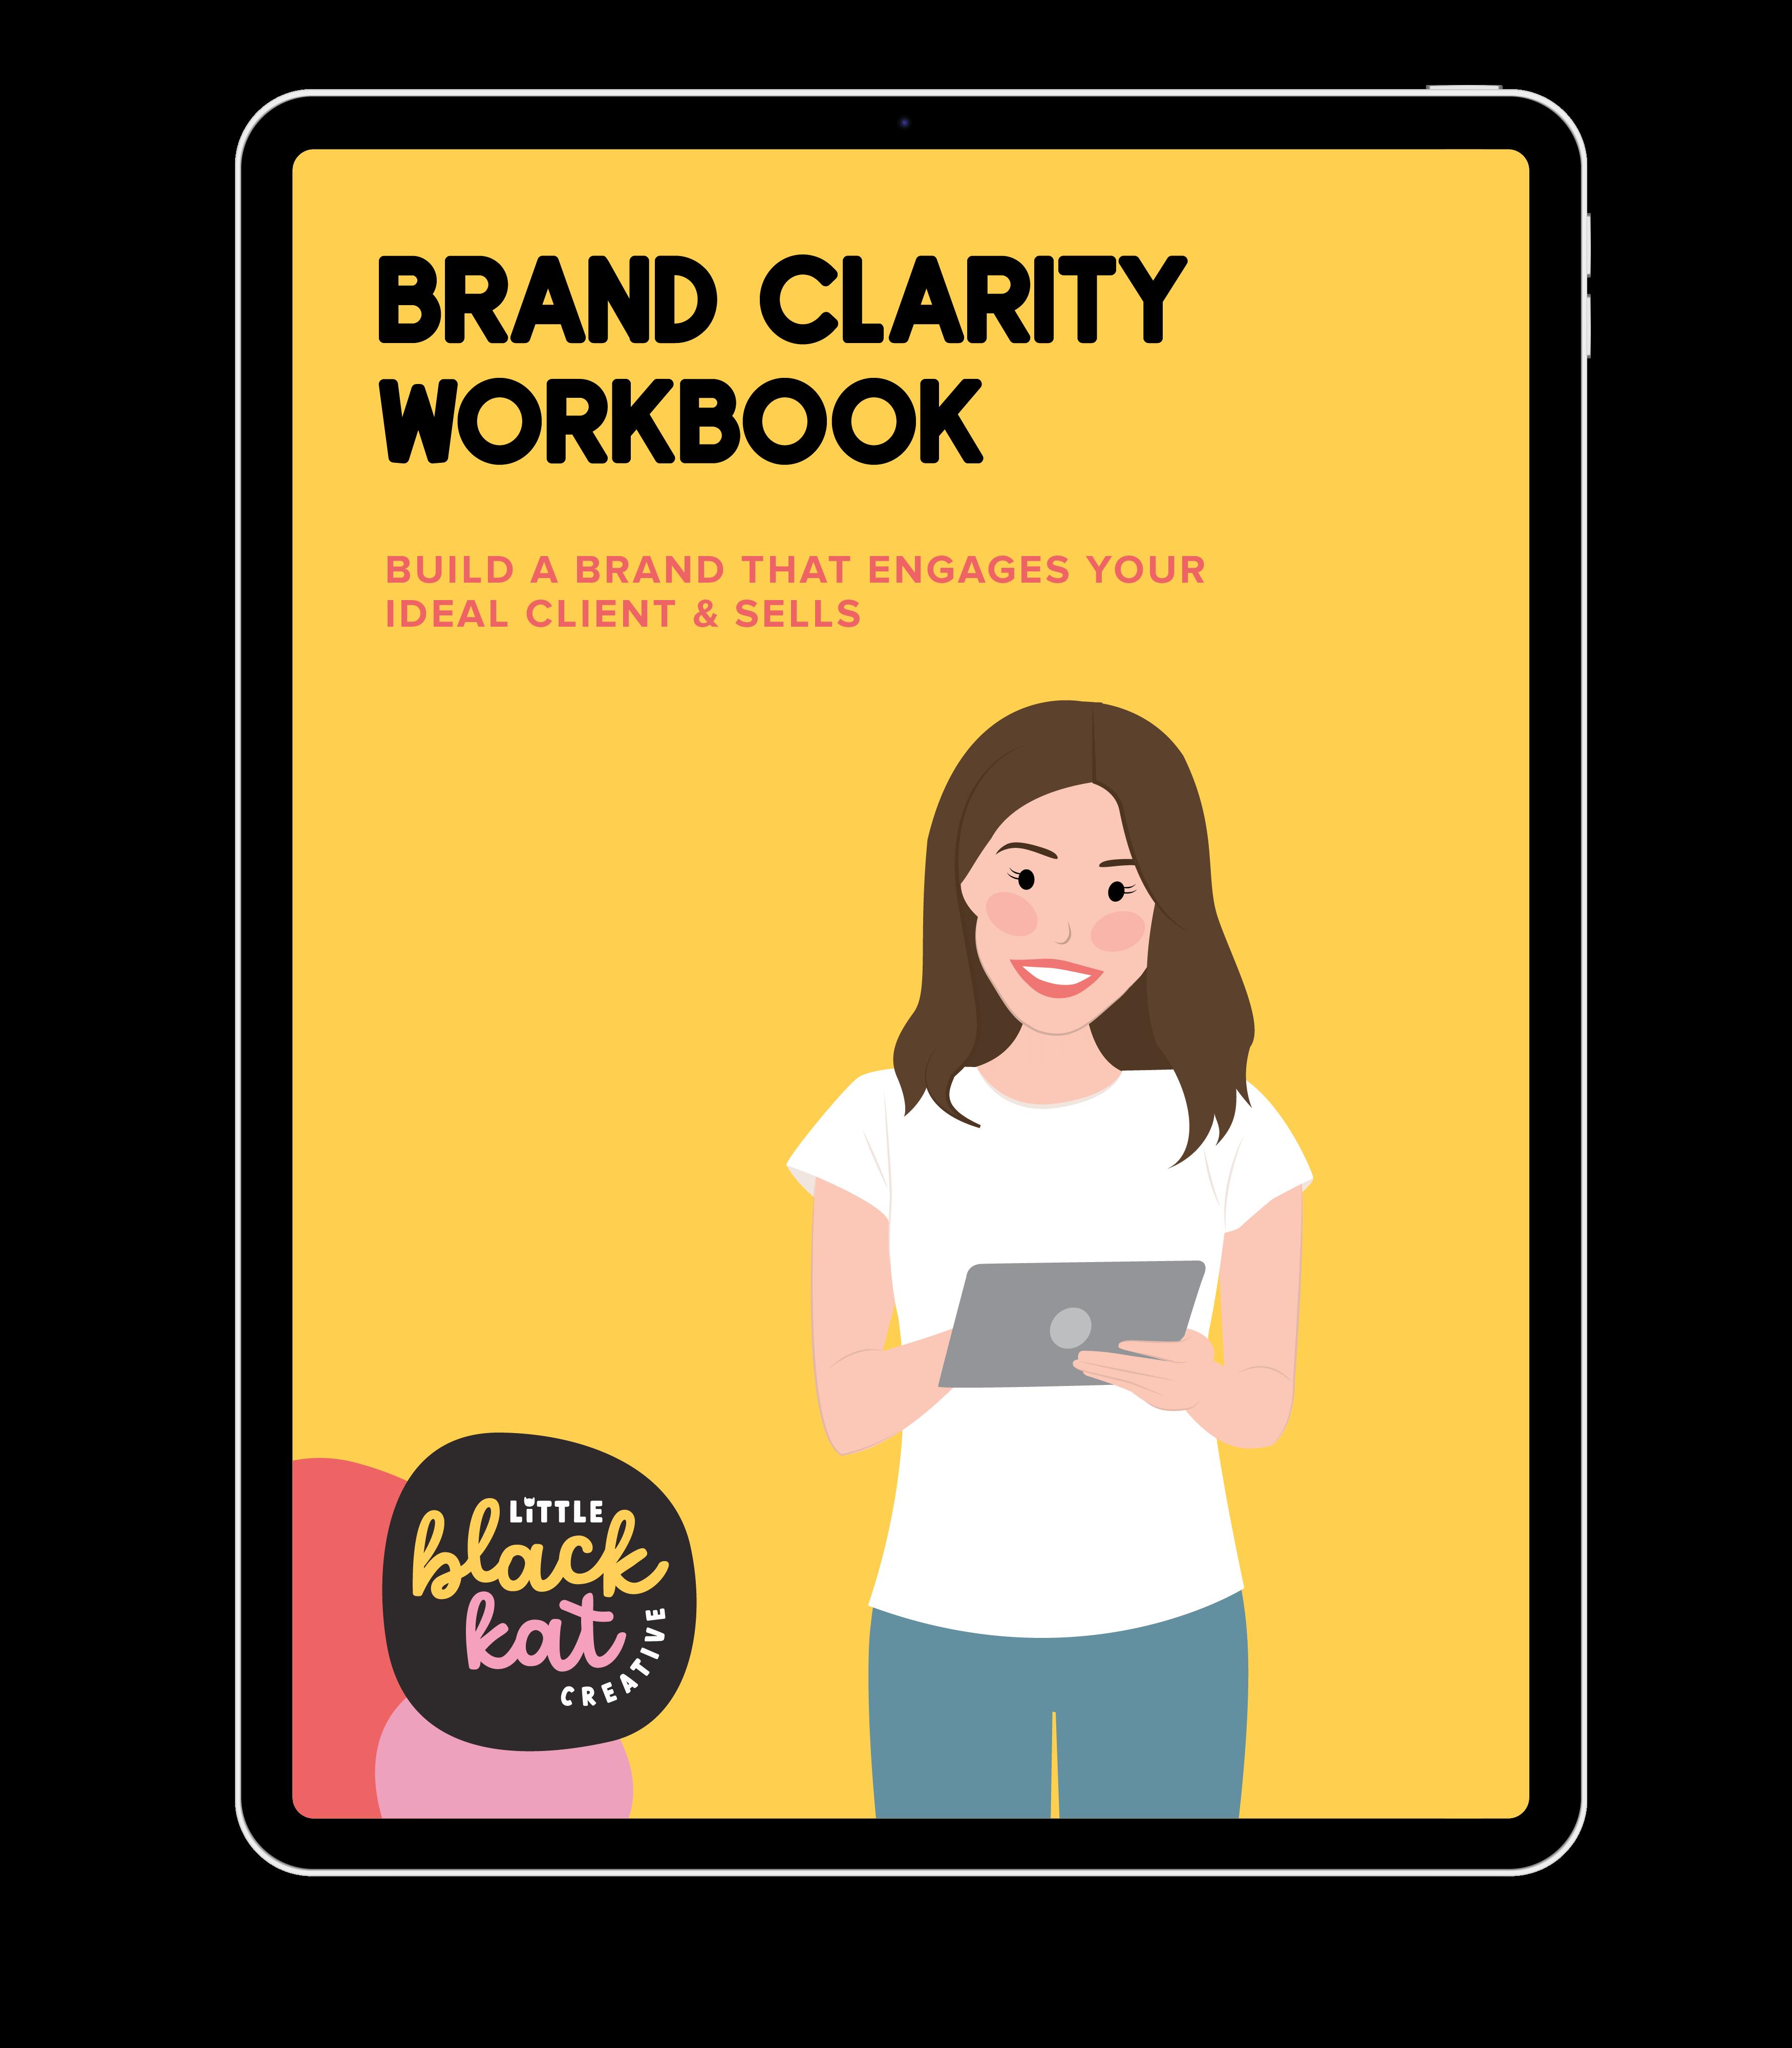 Brand Clarity Workbook download